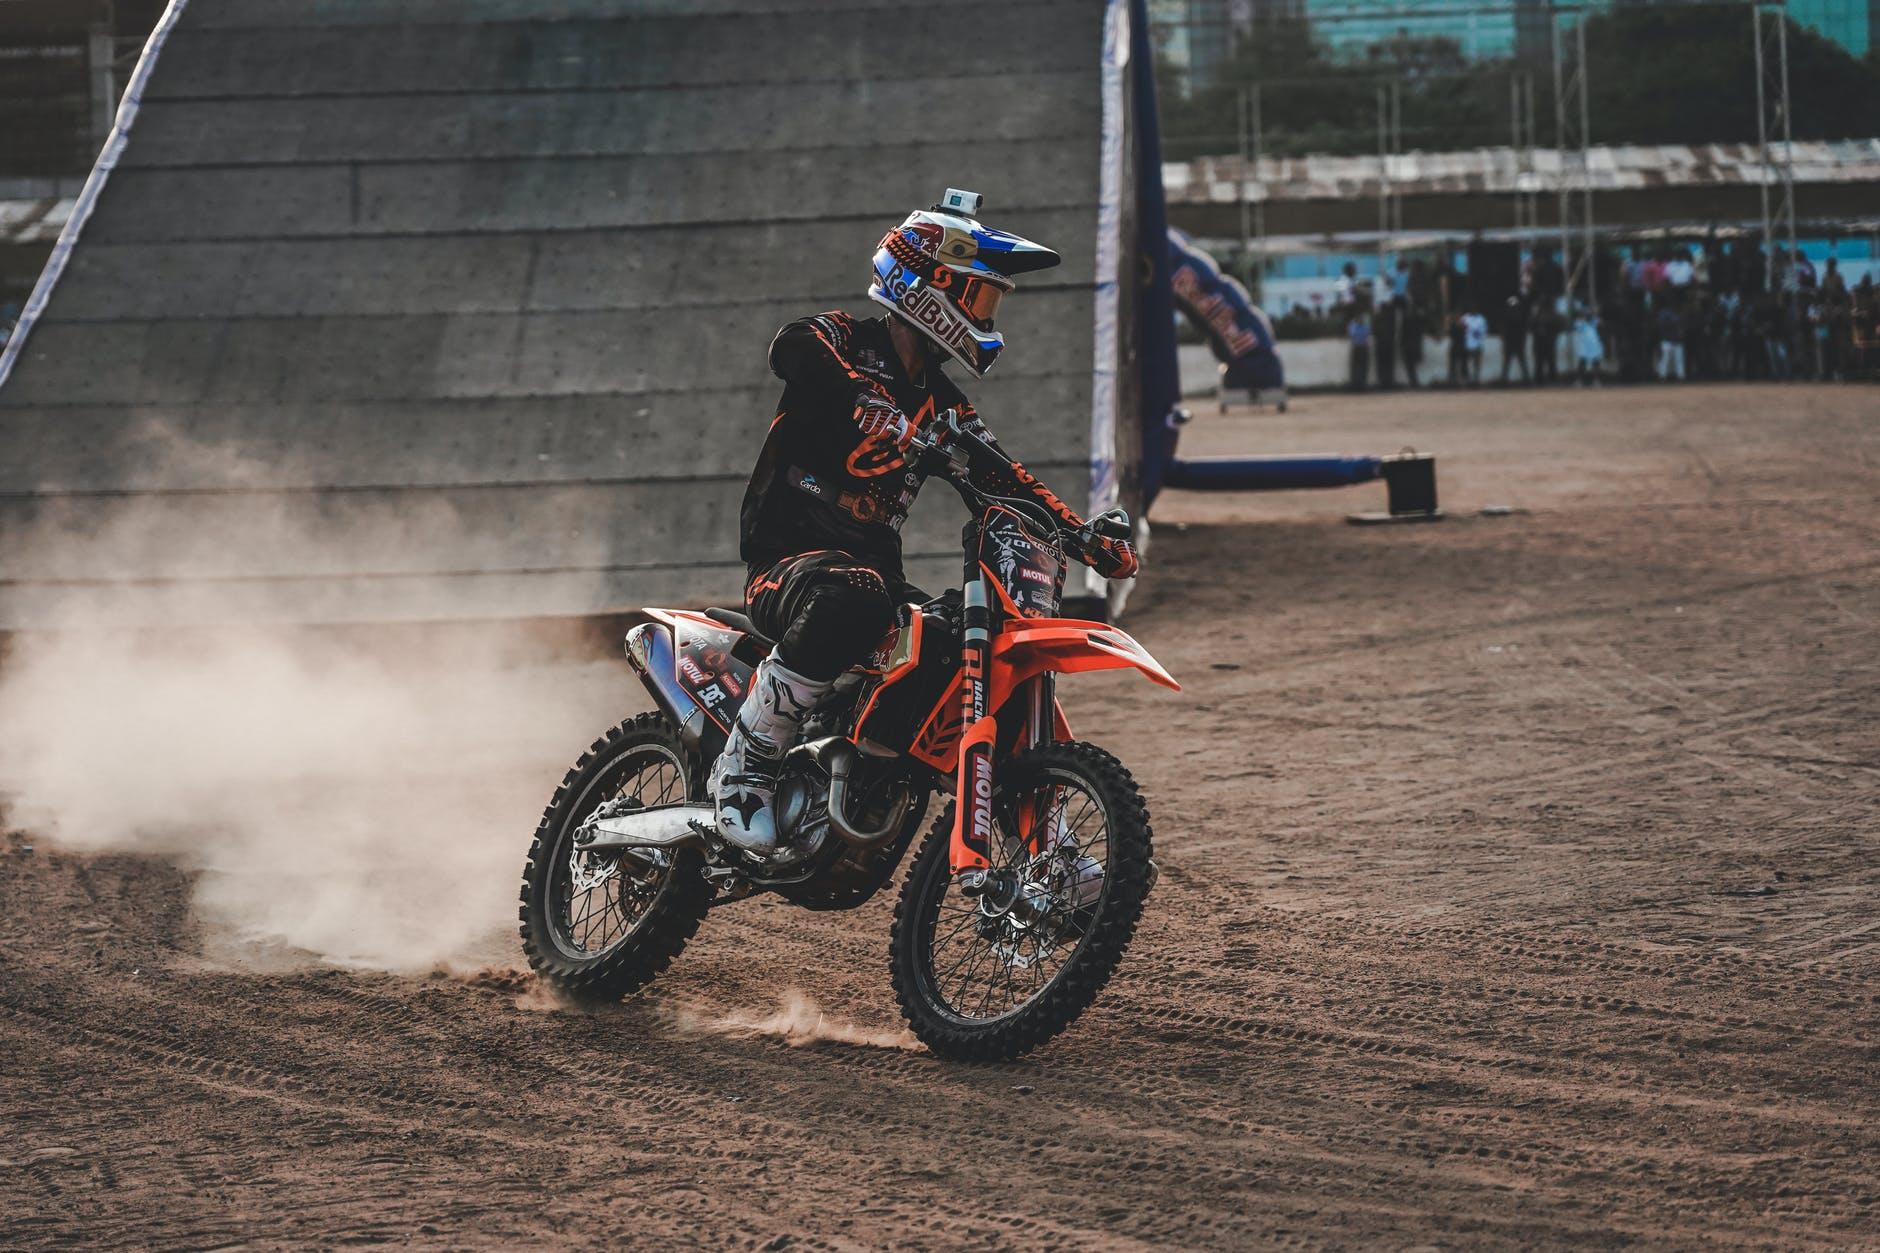 mouvement rapide moto vitesse